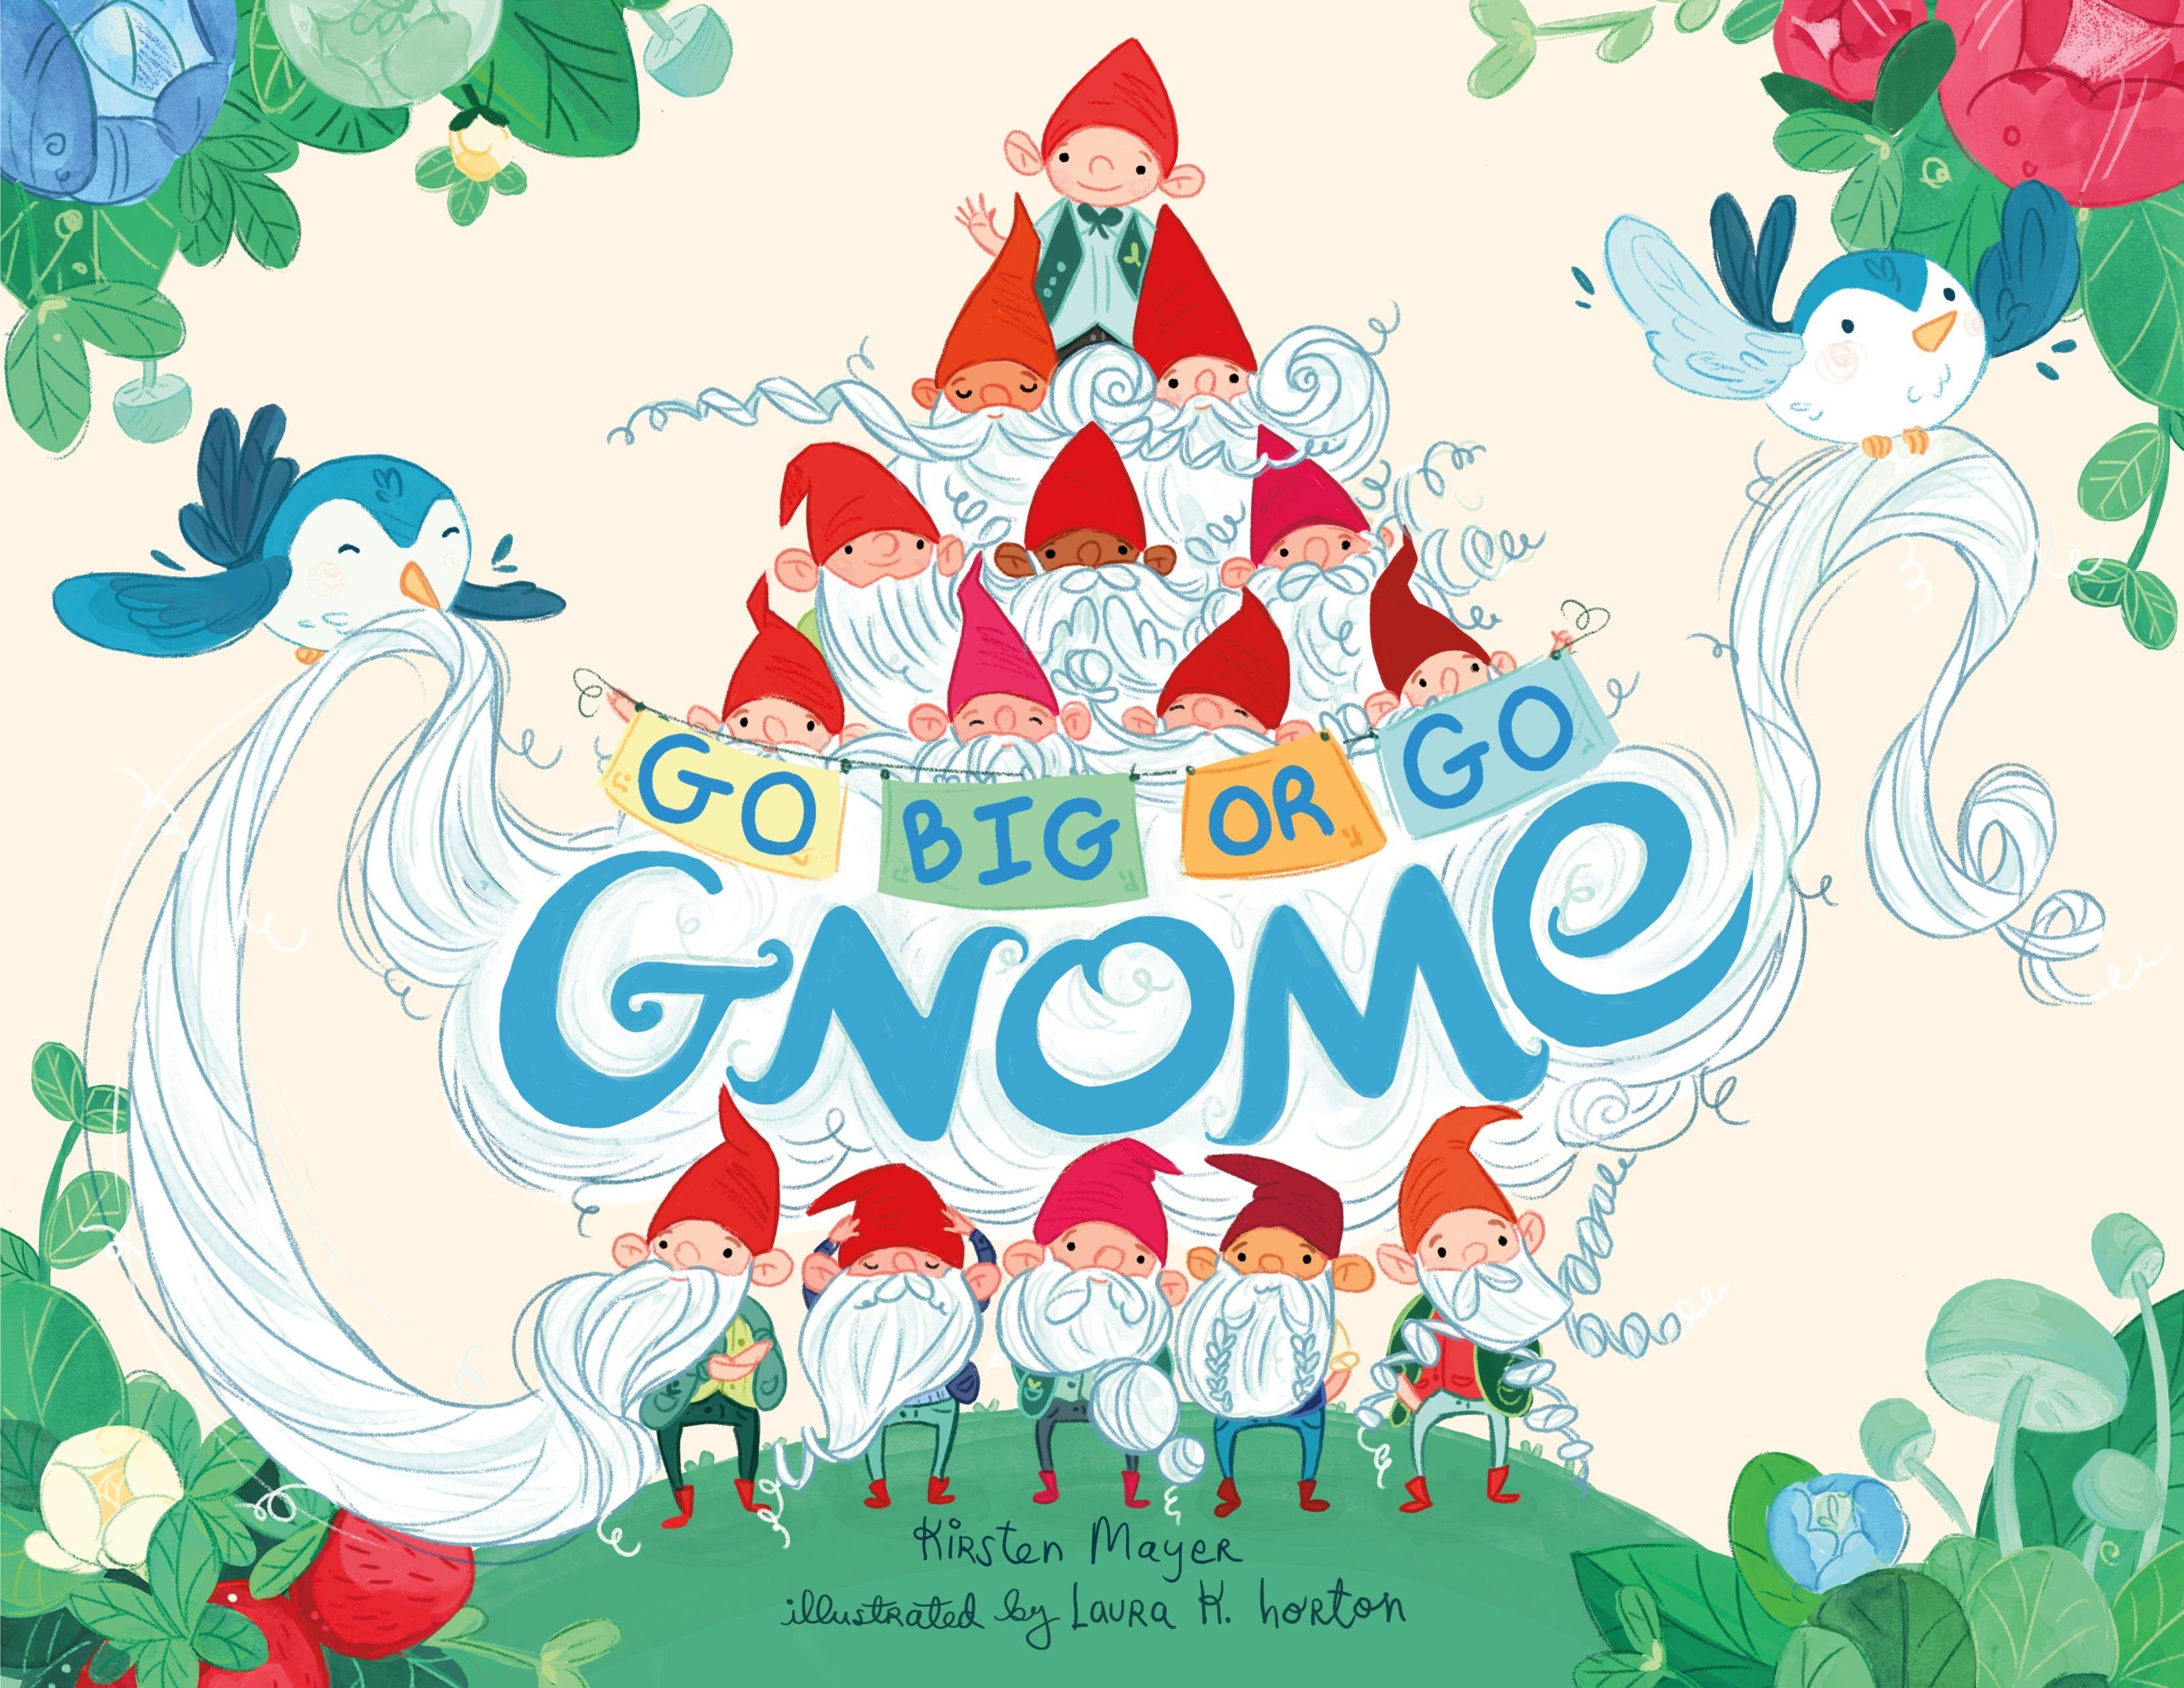 Image of Go BIG or Go Gnome!